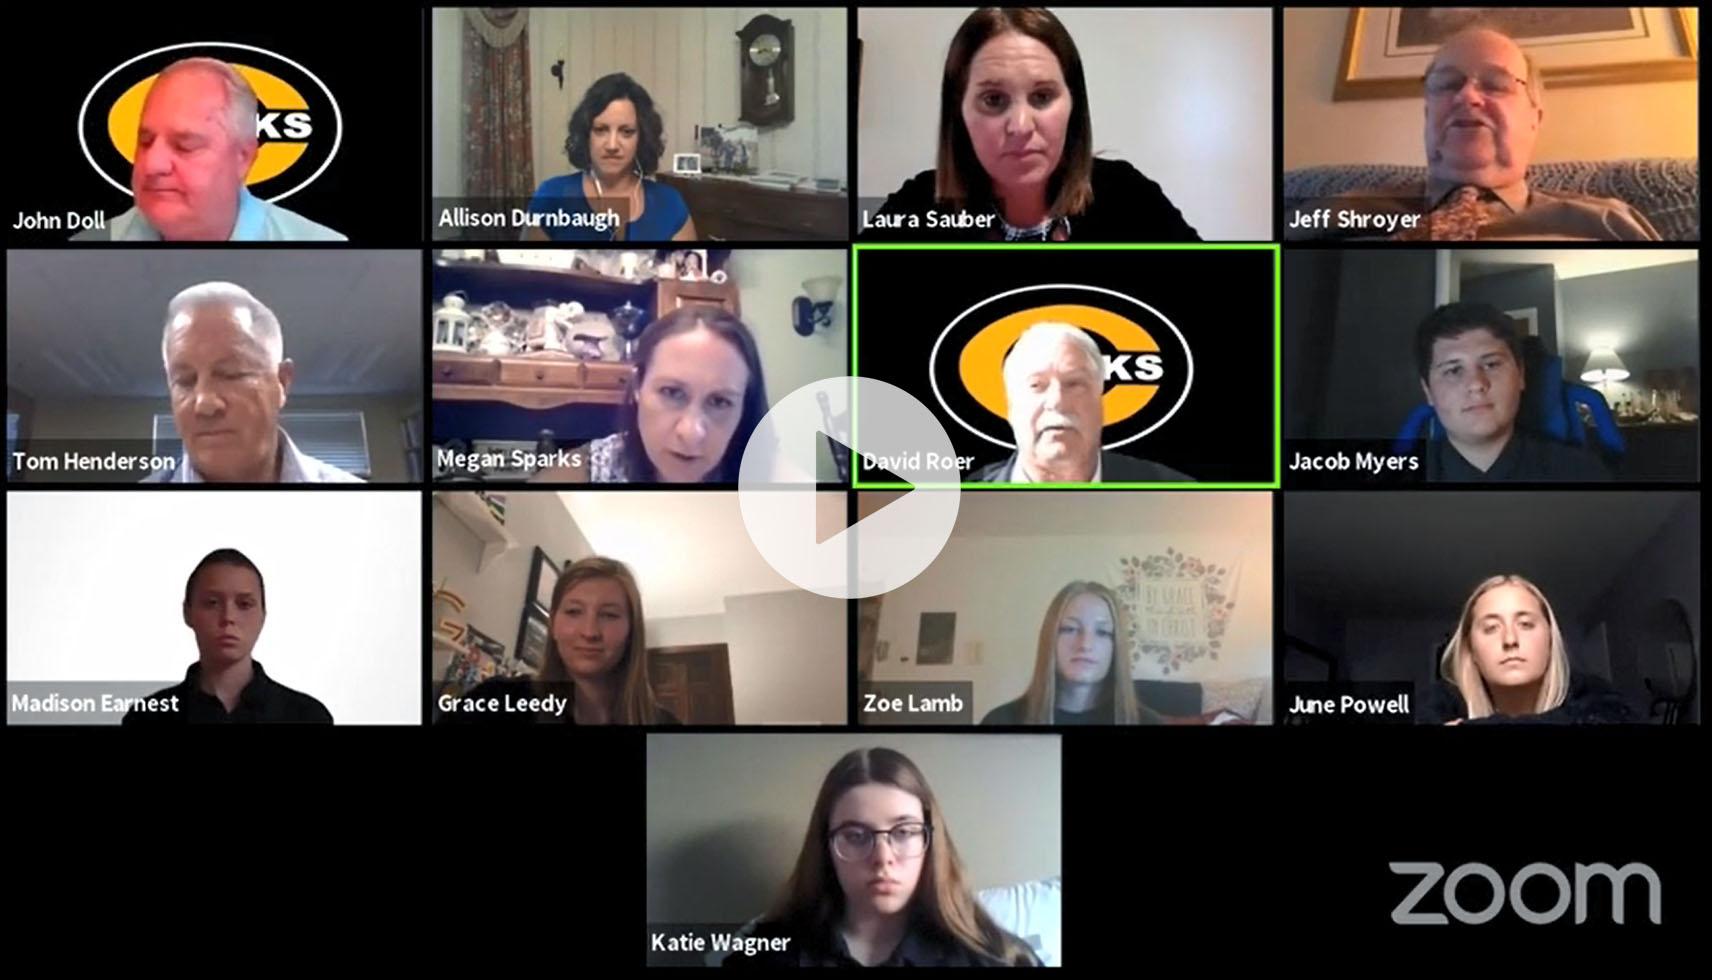 Screenshot of Board of Education virtual meeting